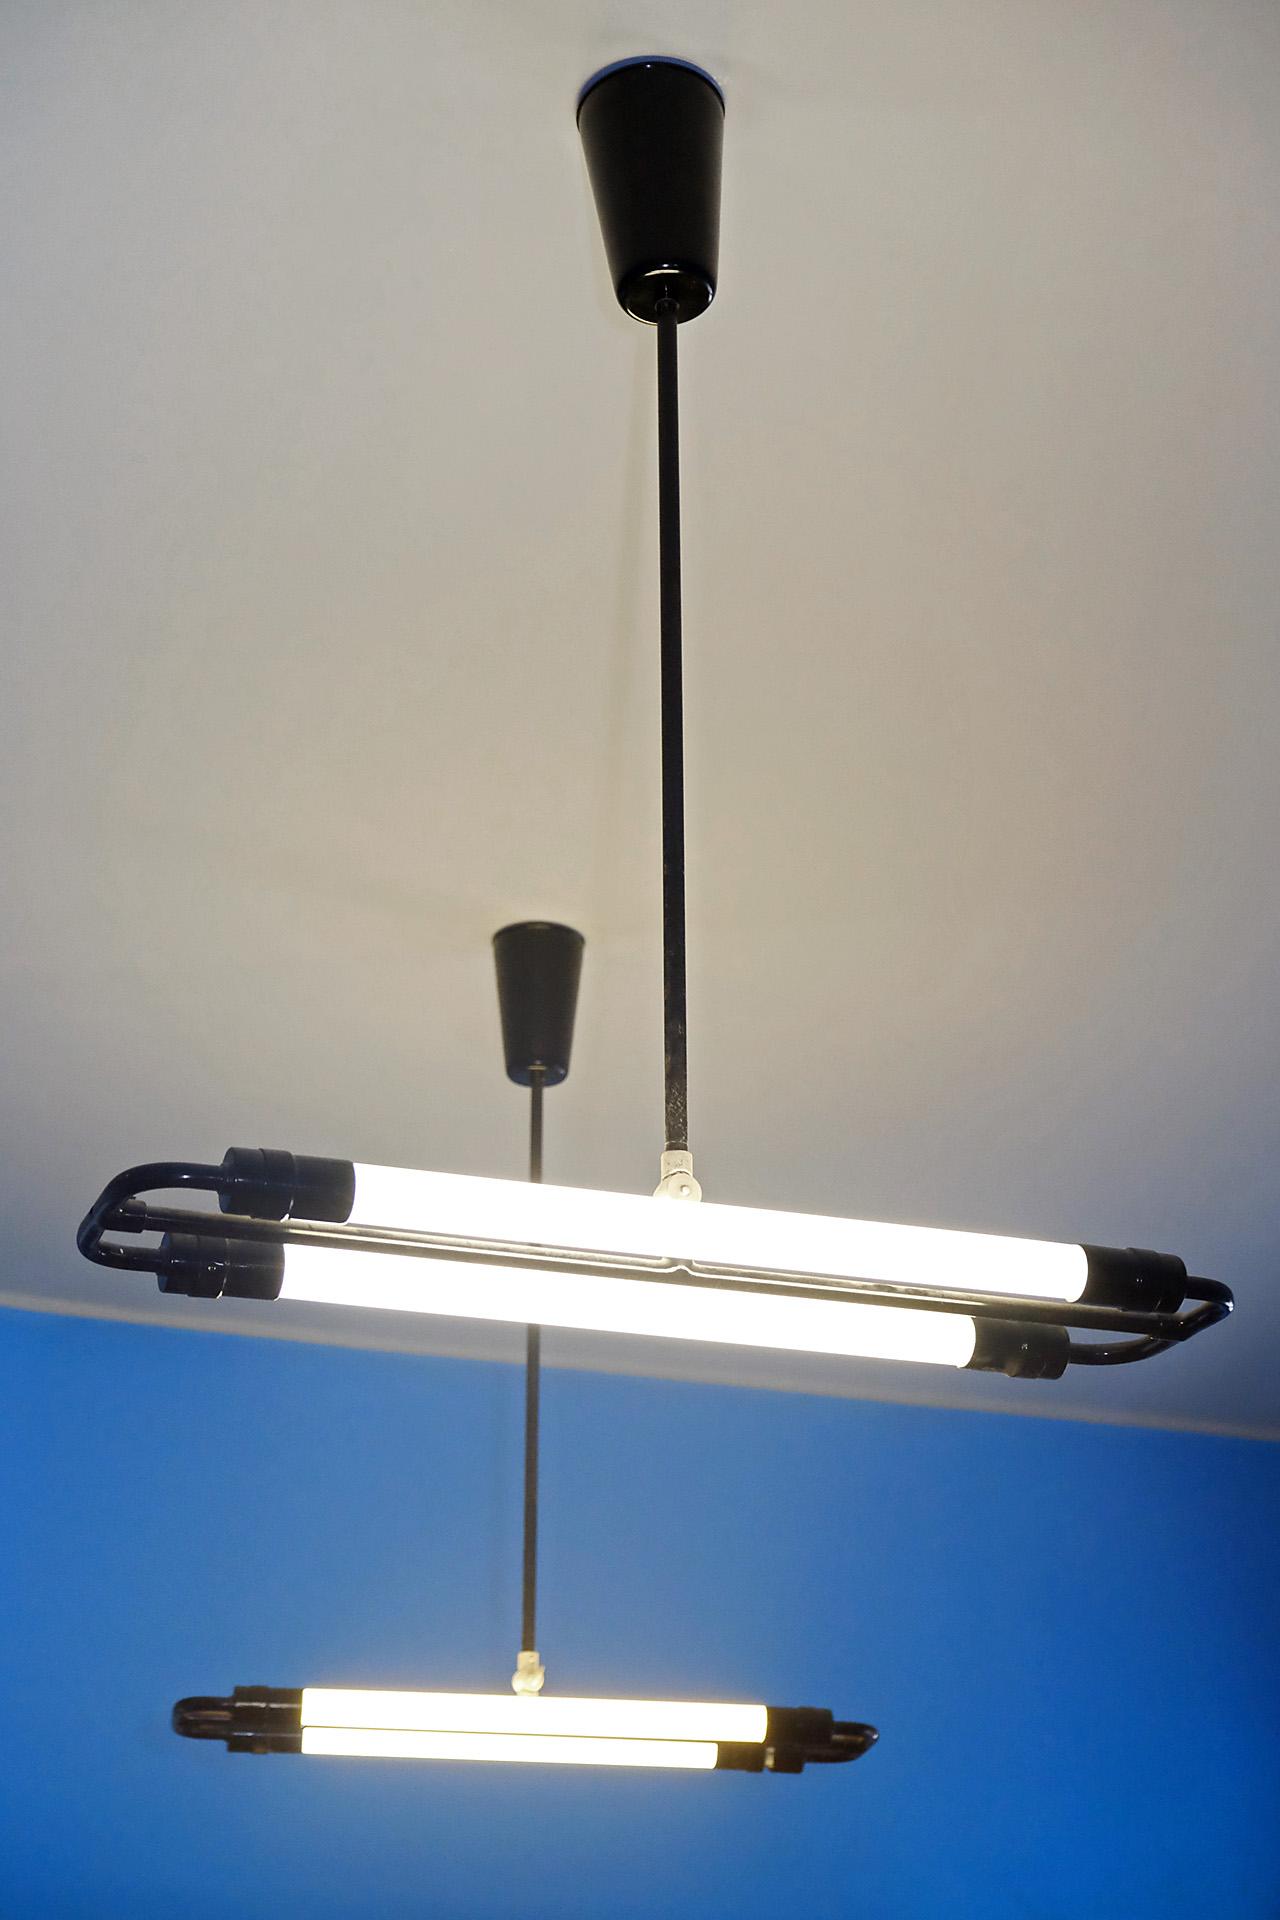 lampen best casanova led seattle mit leselampe with lampen finest oligo licht auf weise with. Black Bedroom Furniture Sets. Home Design Ideas